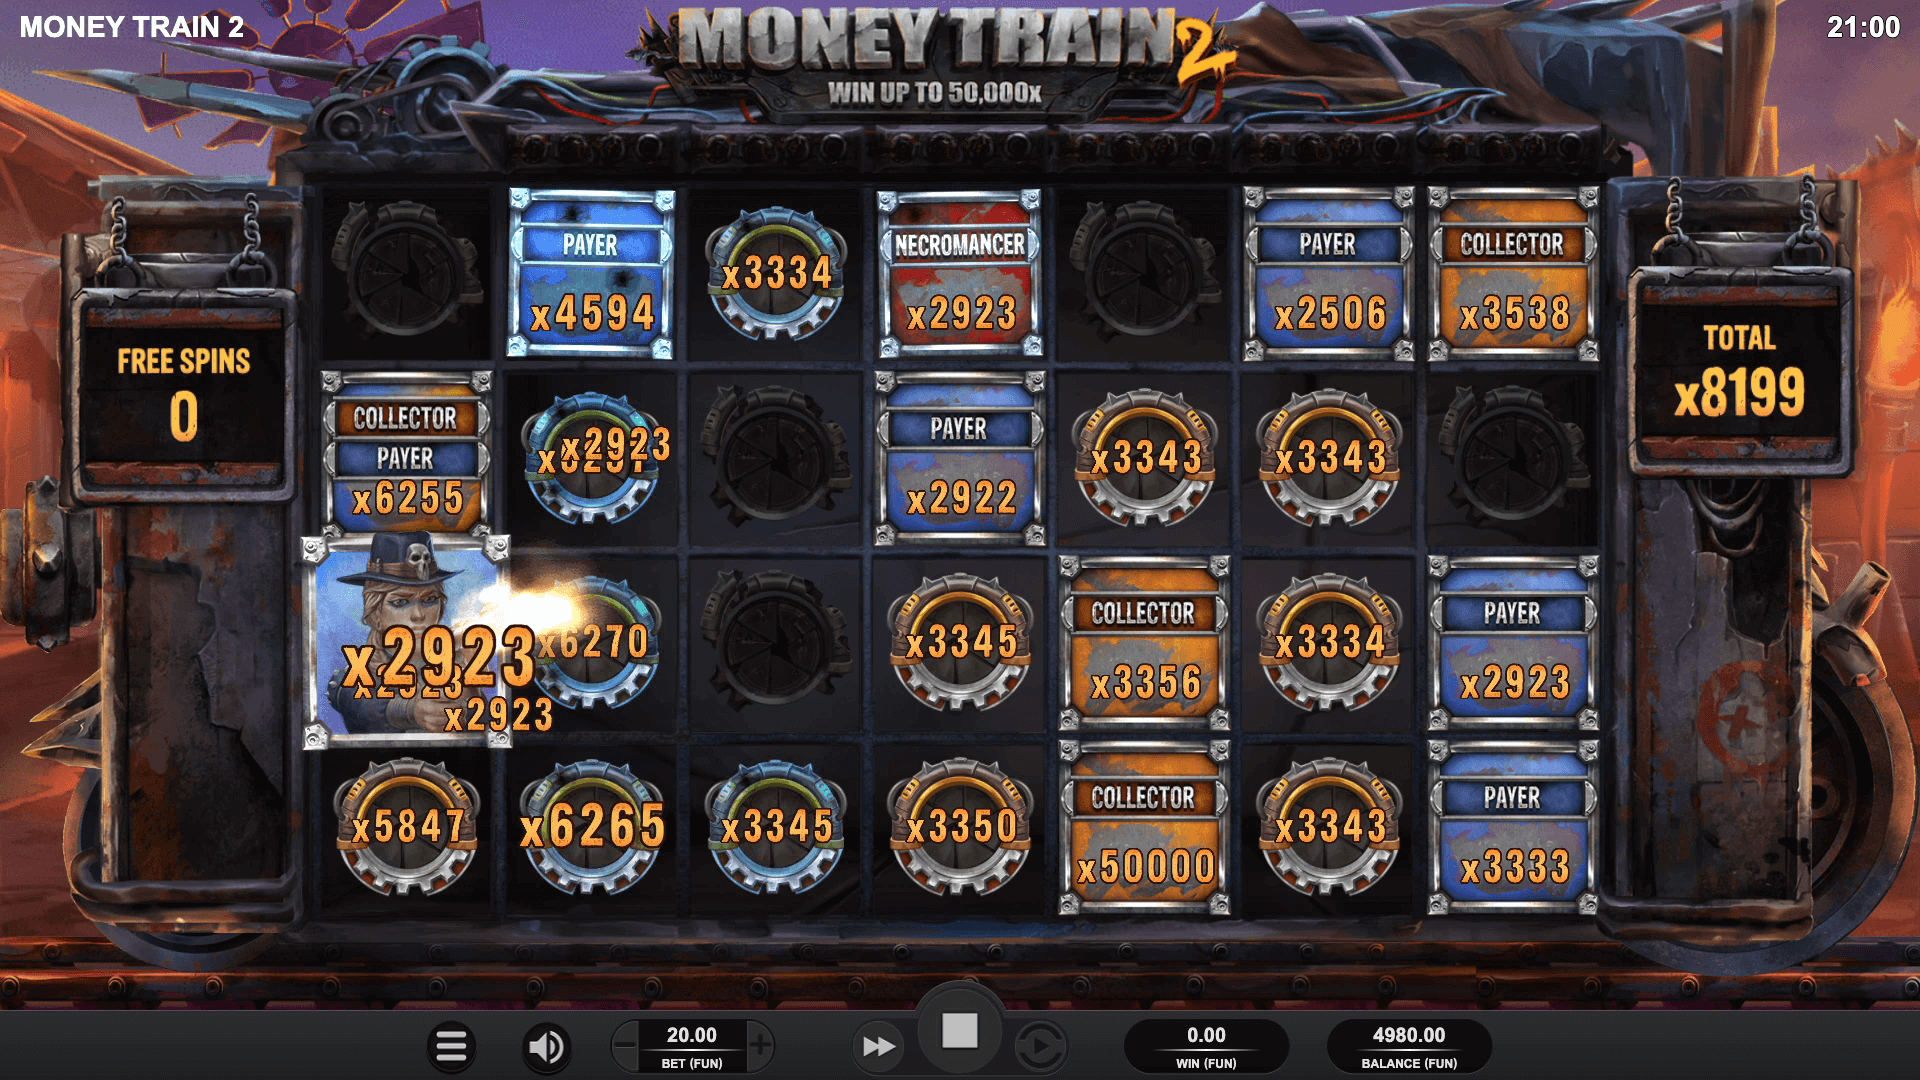 money train 2 slot review and Demo casinos 2021